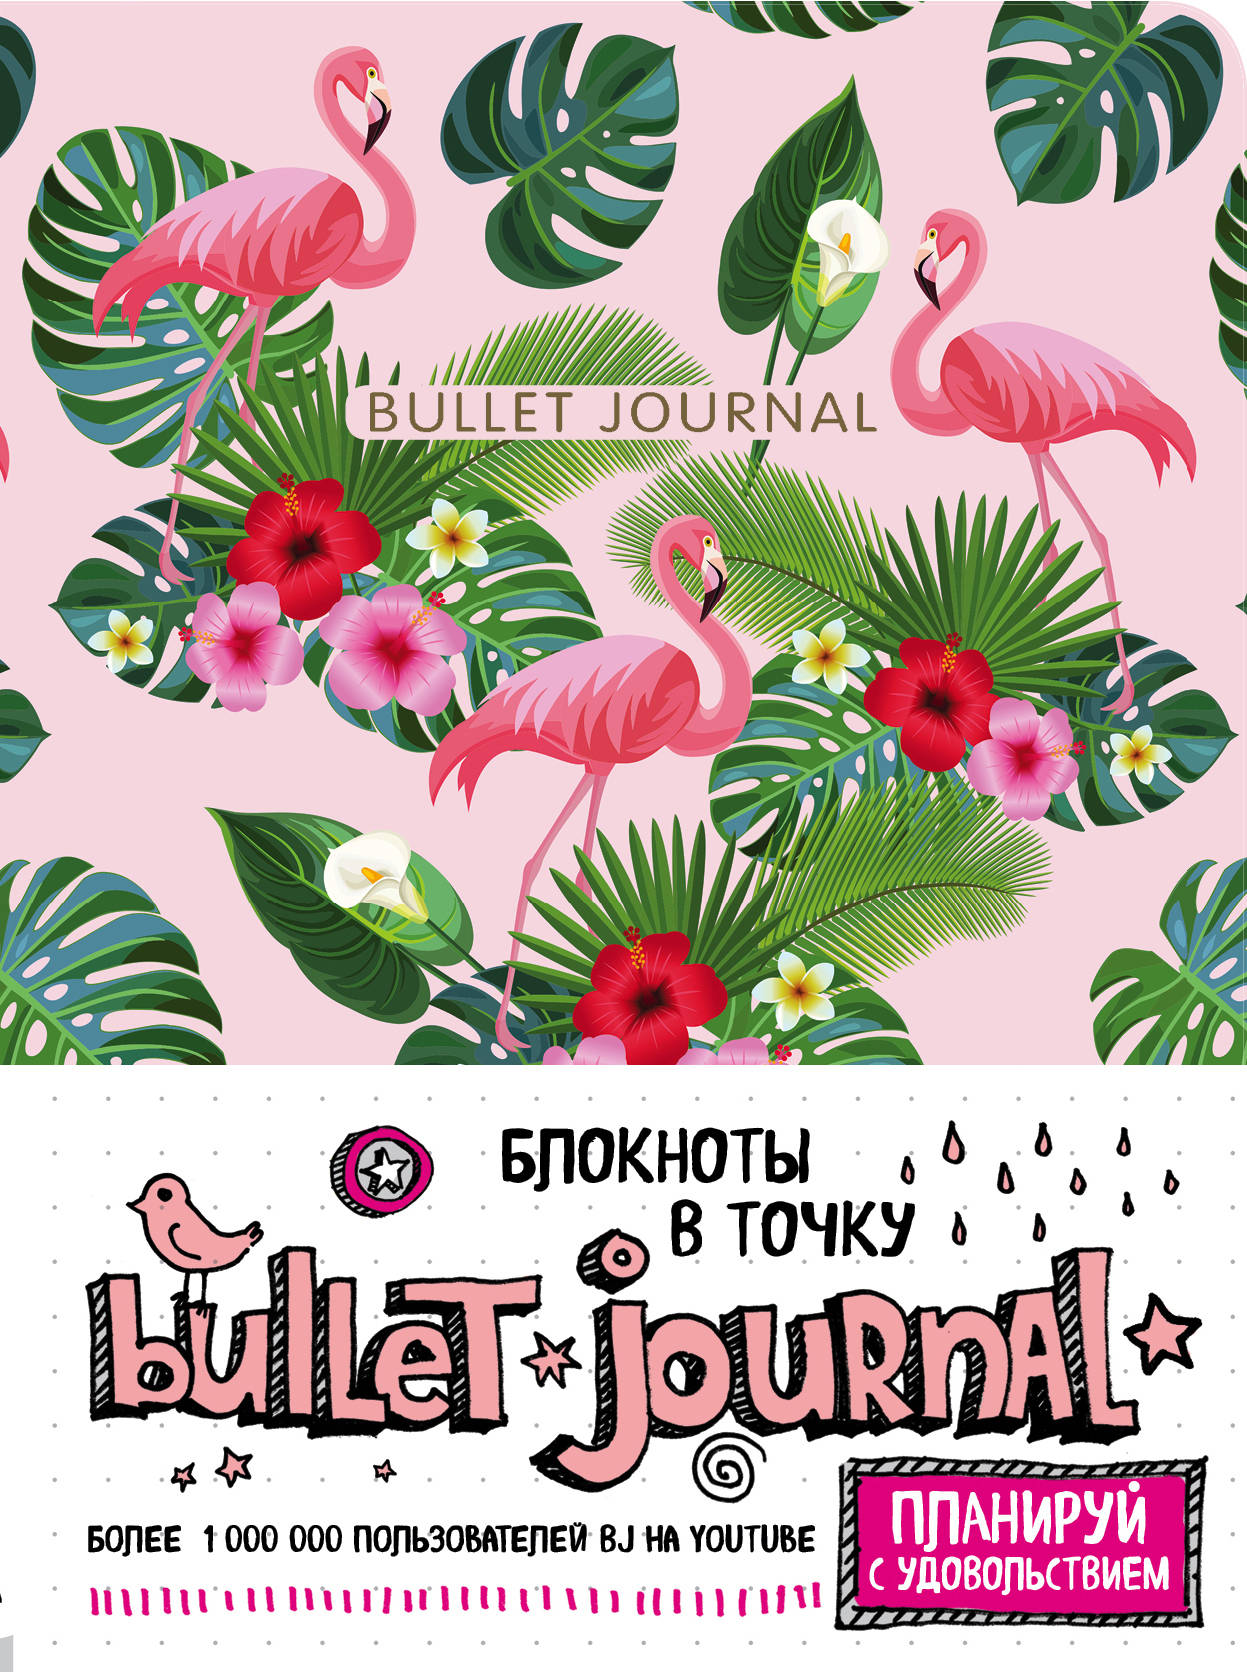 Блокнот в точку: Bullet Journal (фламинго)